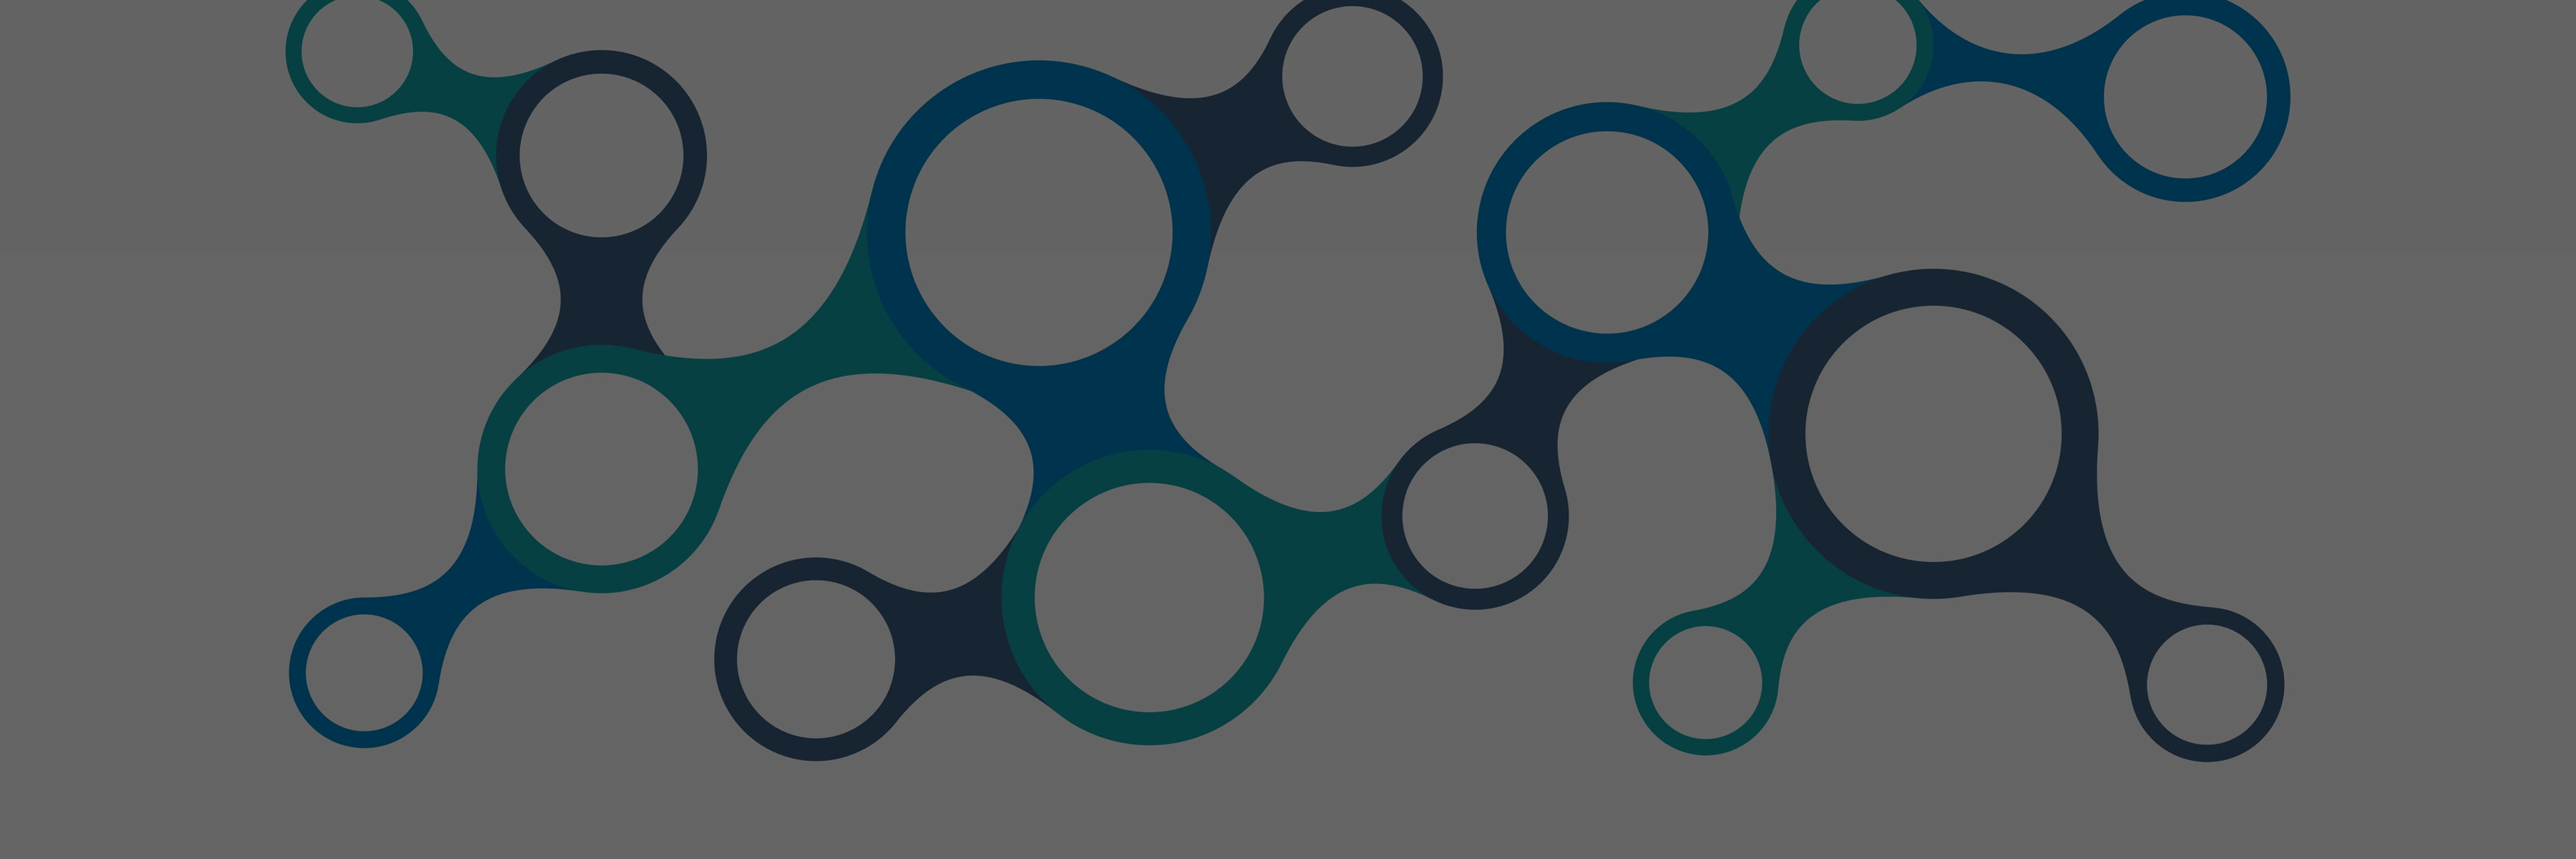 naem-webinar-2016-integrating-ehs-management-systems-into-operations-1800x600-min